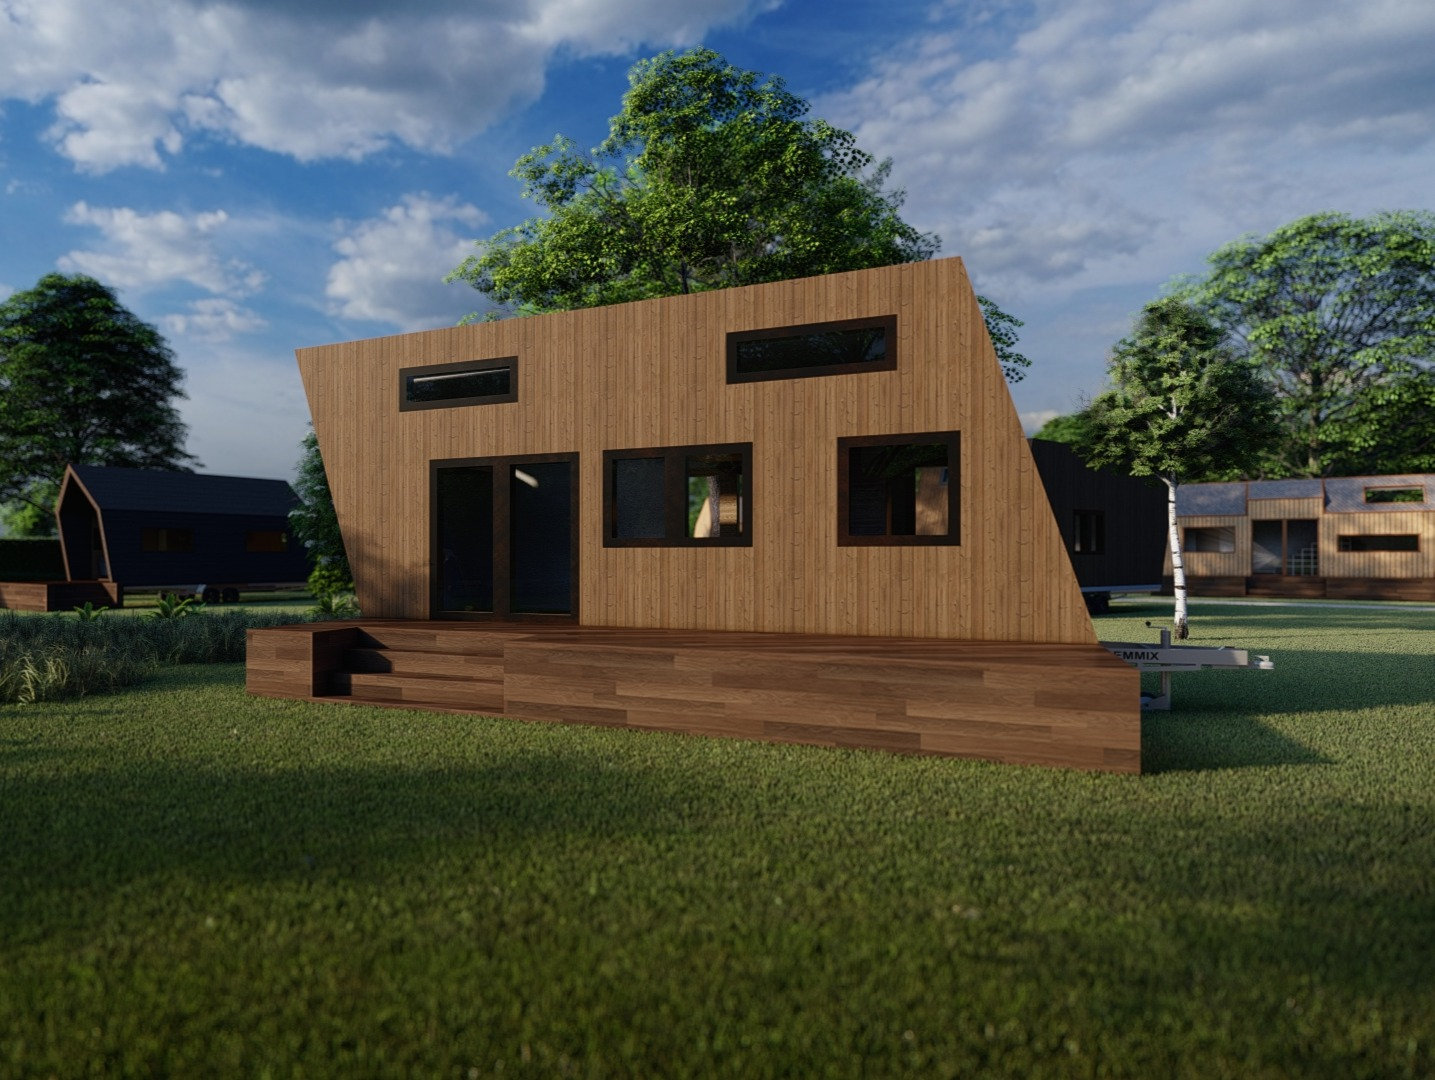 Standard Tiny house